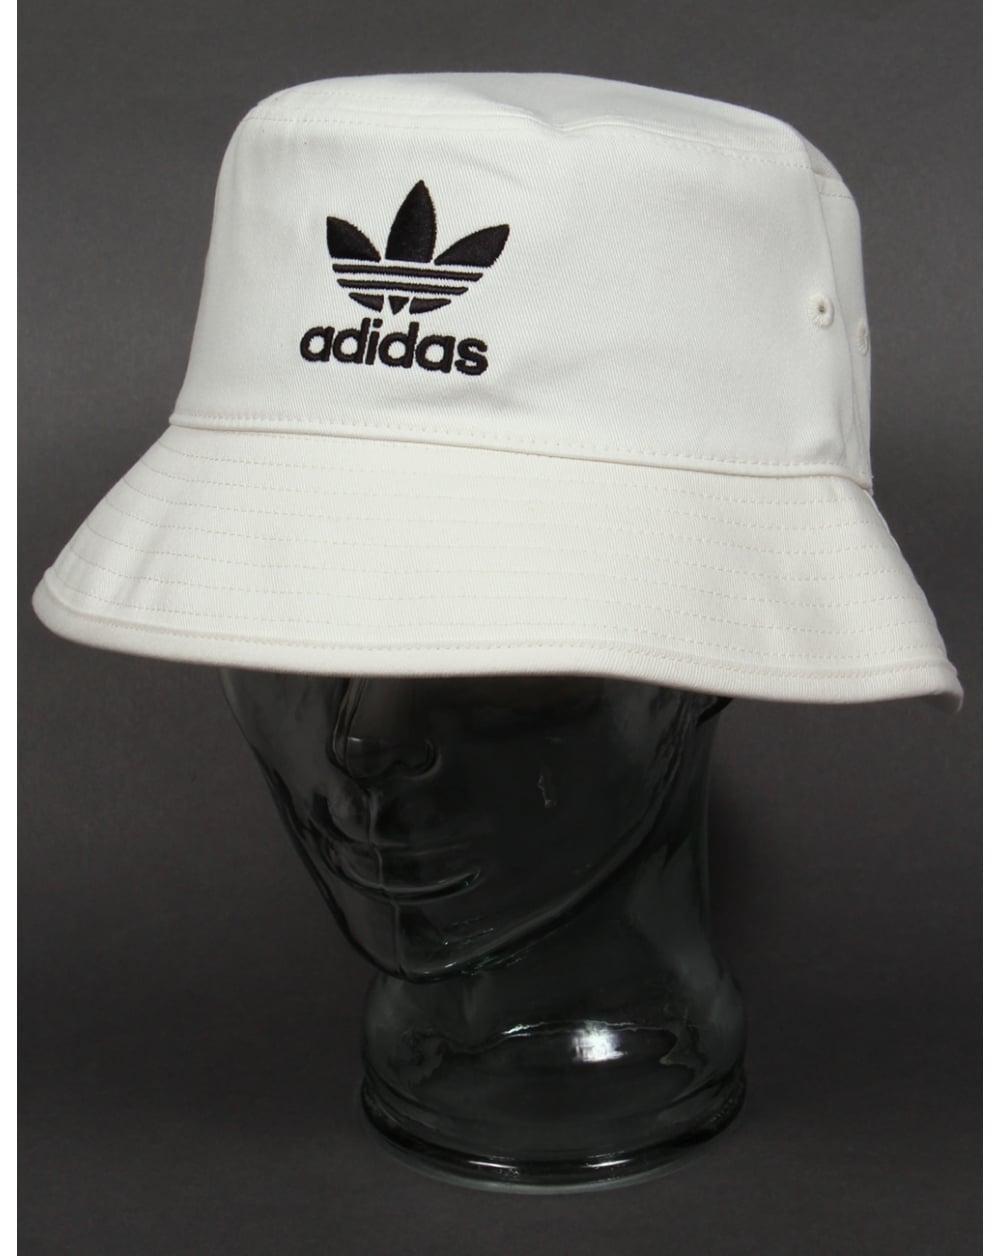 89beab88763 adidas Originals Adidas Originals Bucket Hat With Trefoil White black